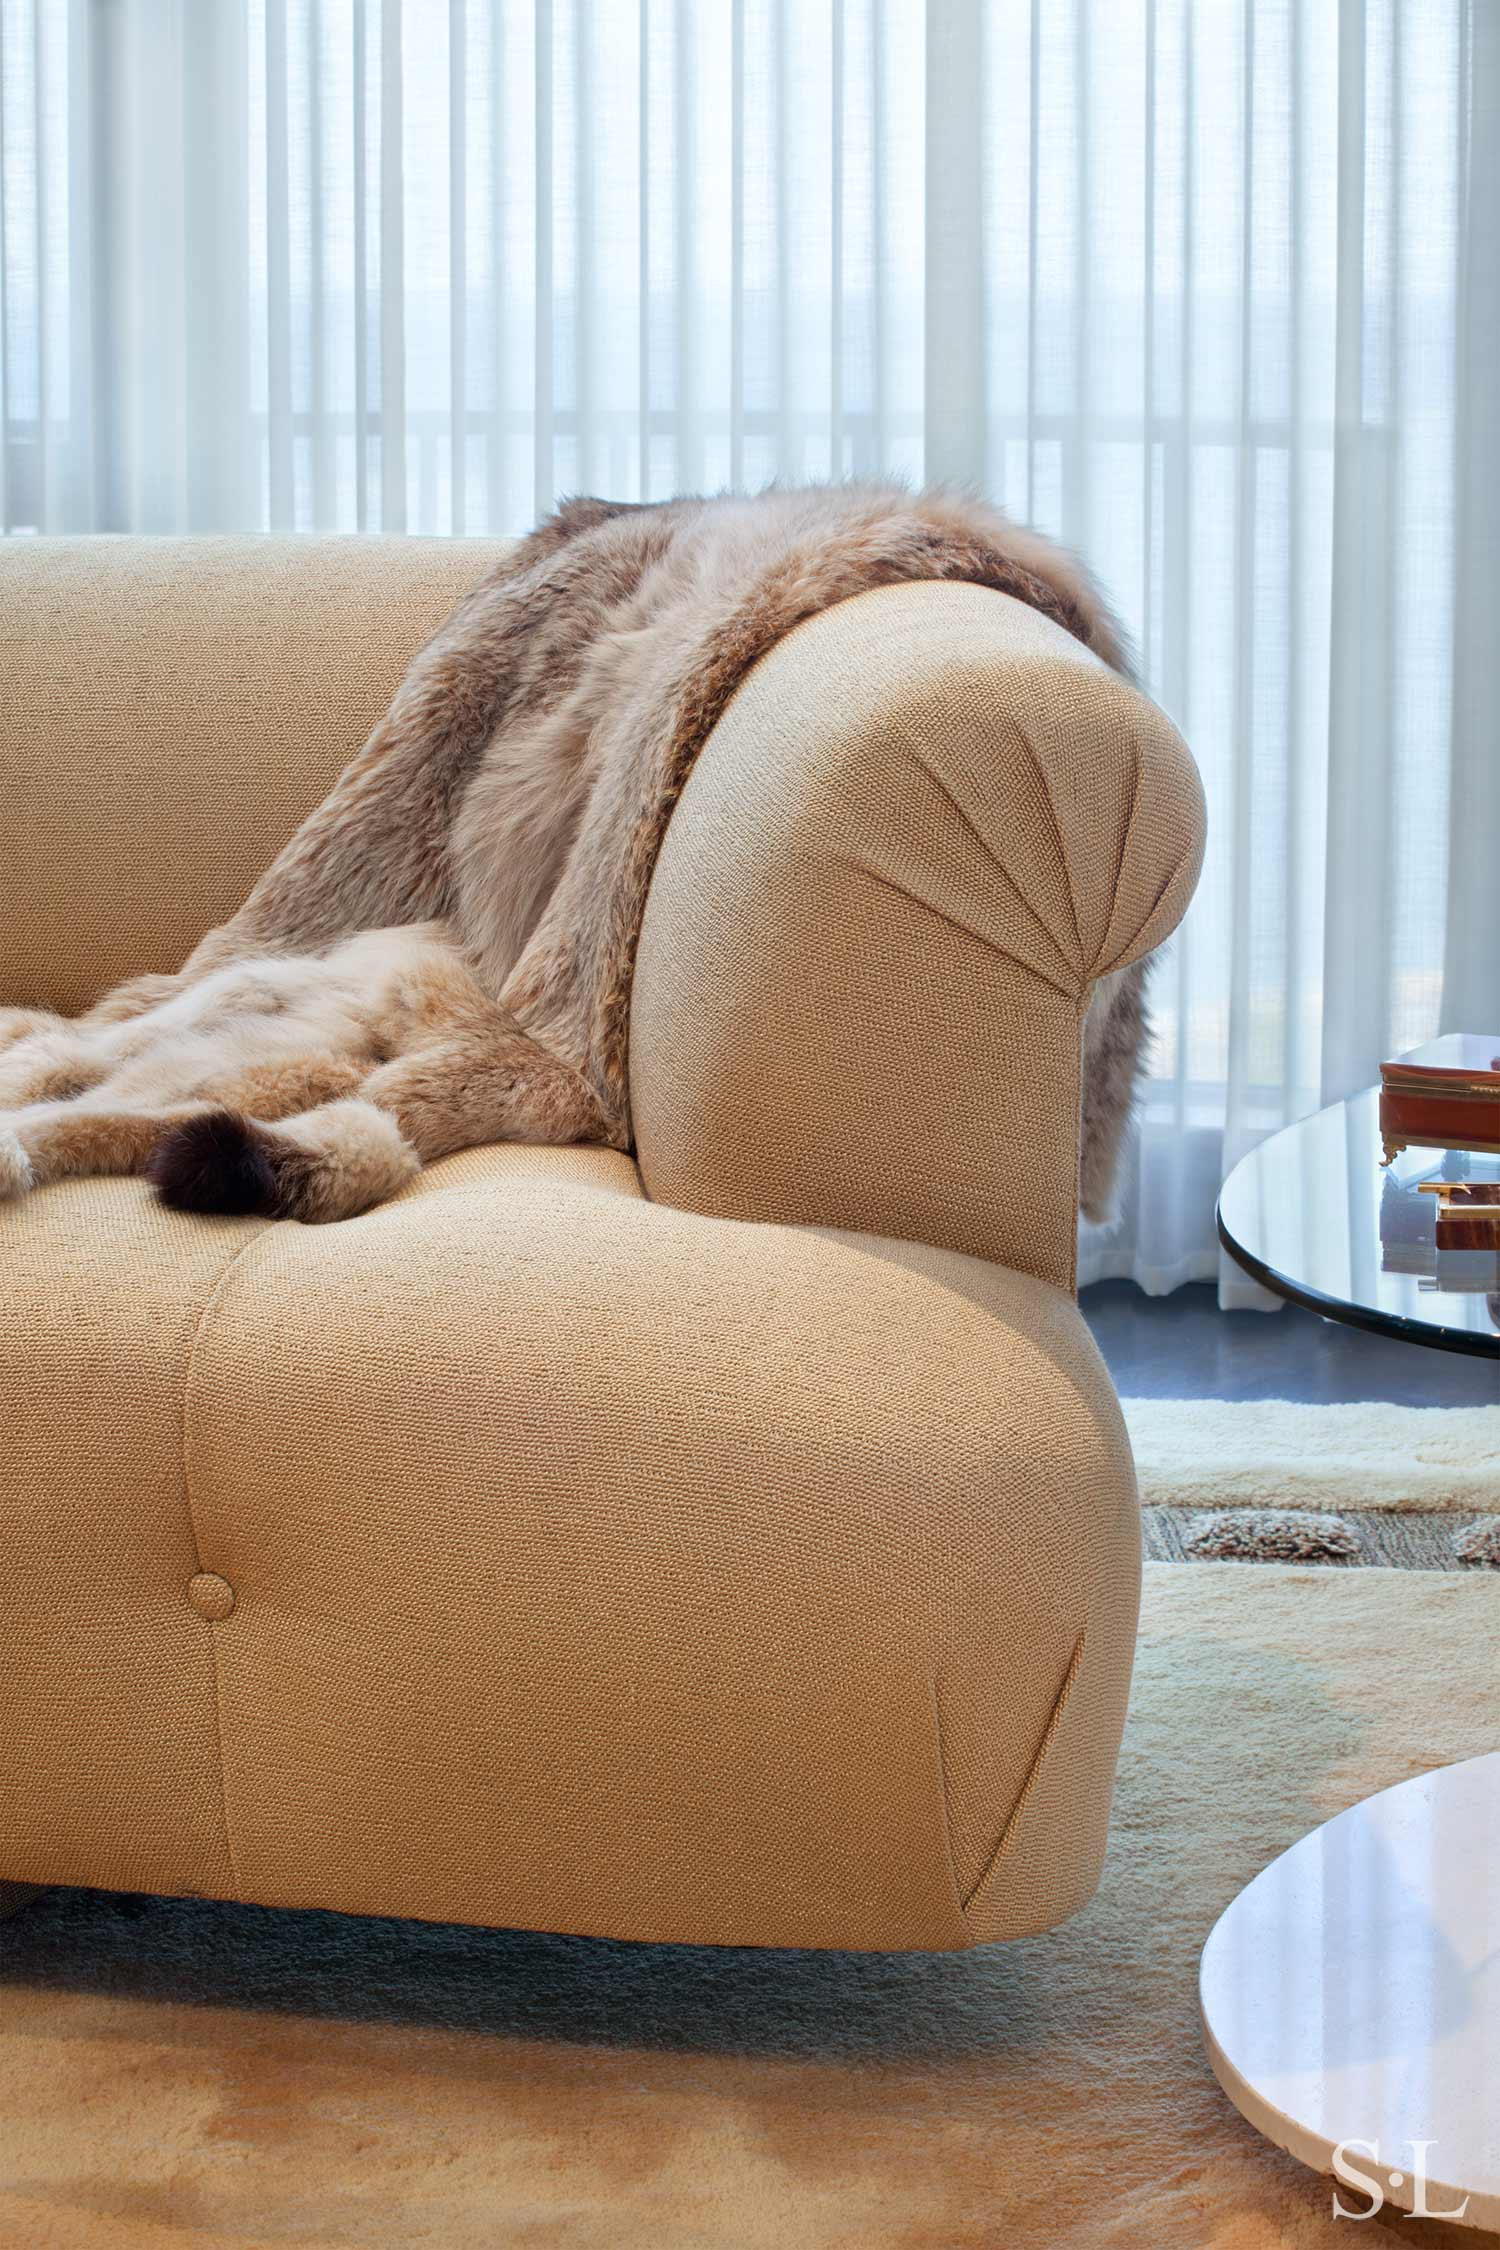 custom curved sofa  Interior Architecture & Design: Suzanne Lovell, Inc.